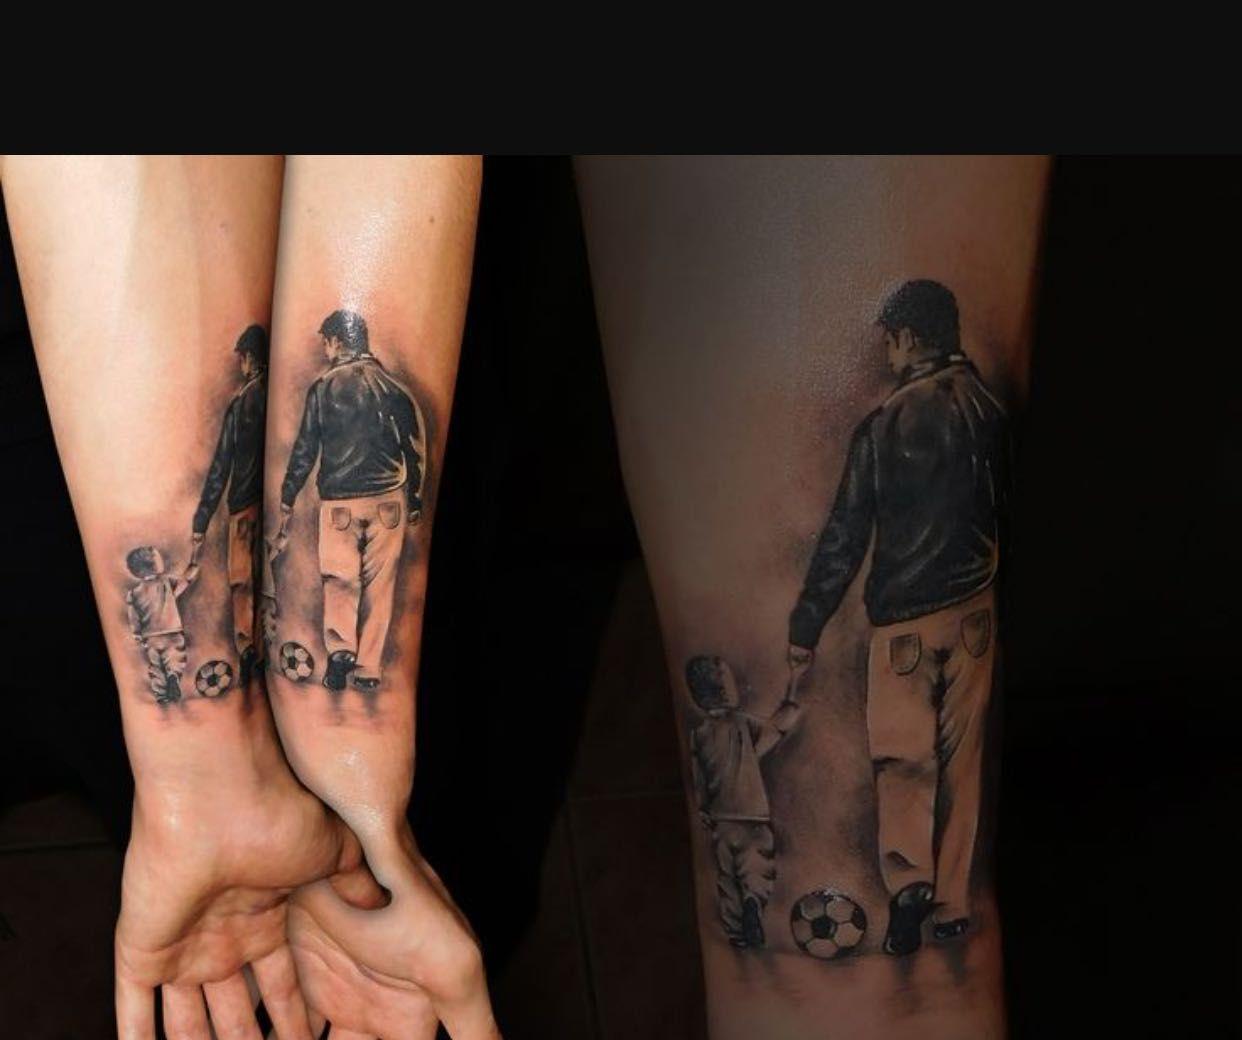 Tatuajes Union Padres E Hijos